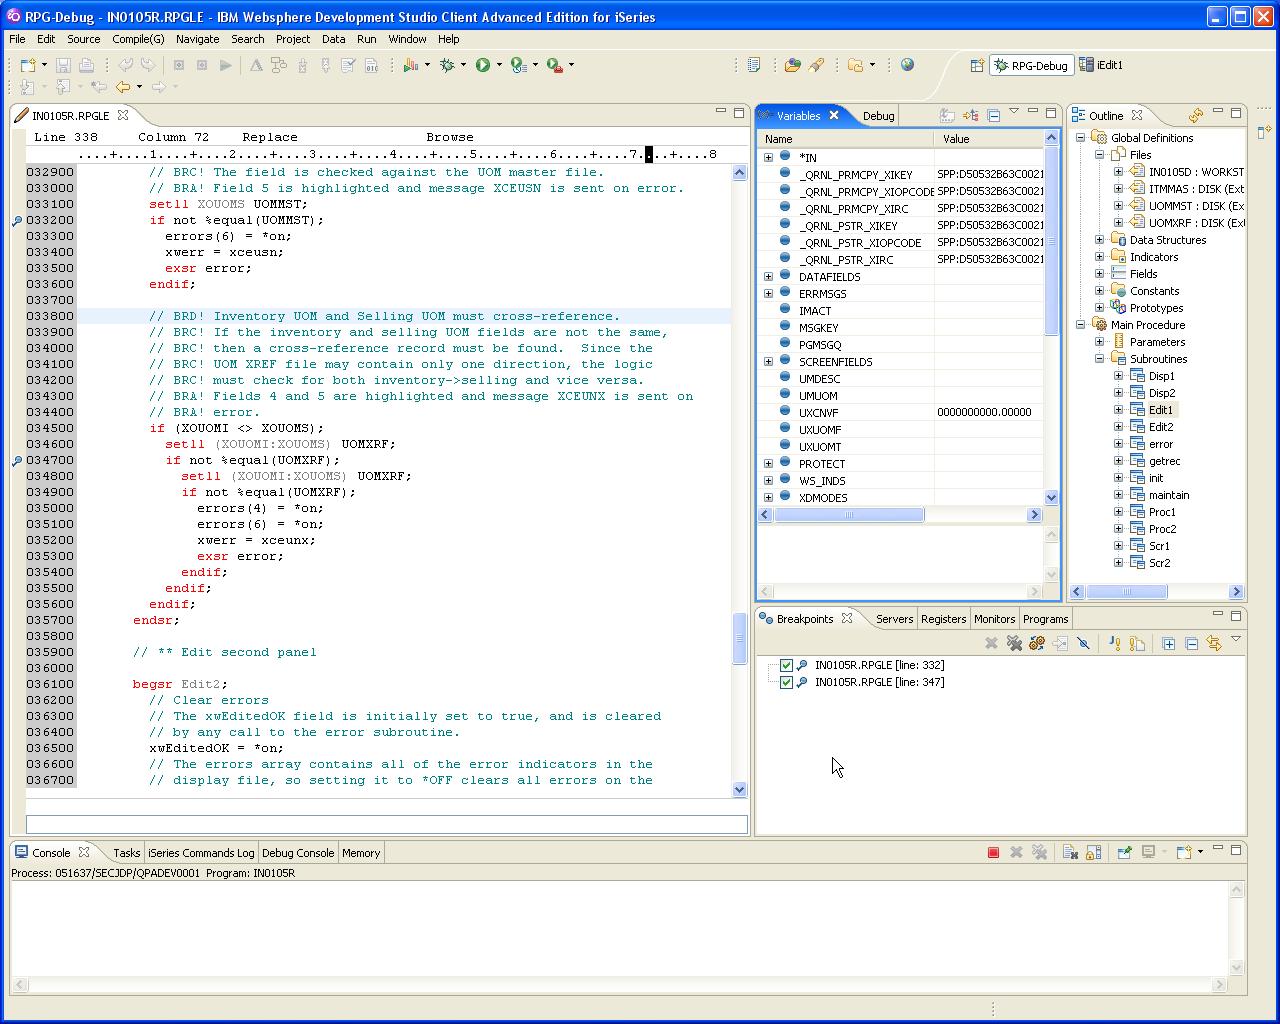 Weaving WebSphere: Debugging a Running System i Job